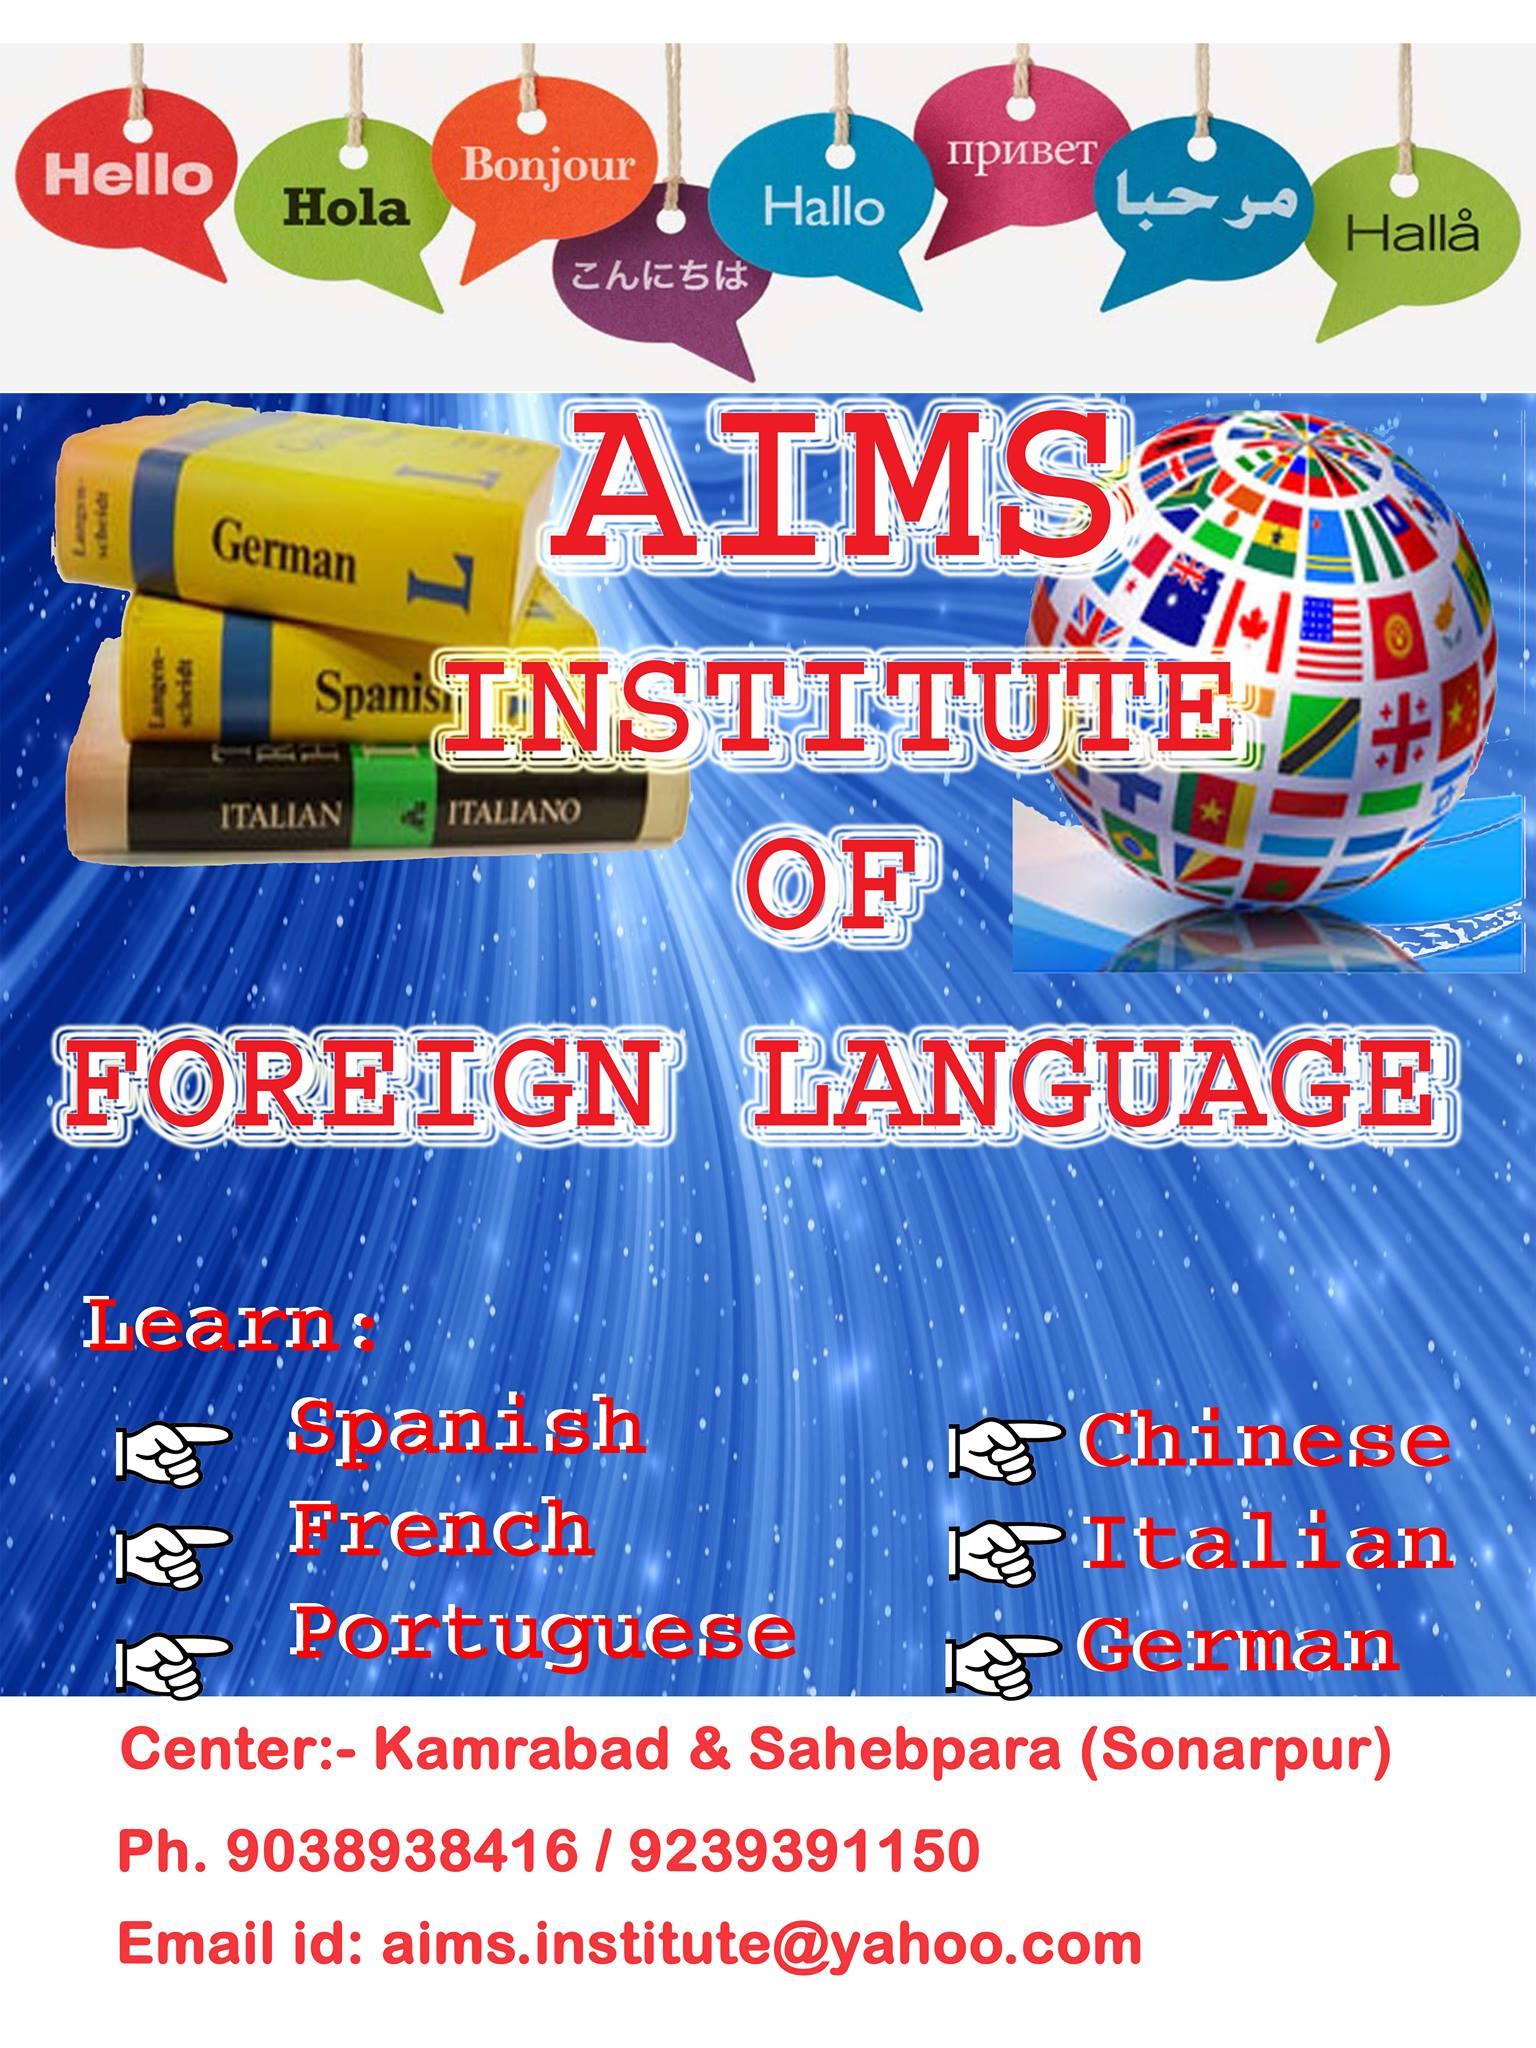 AIMS INSTITUTE OF FOREIGN LANGUAGES in Sonarpur, Kolkata